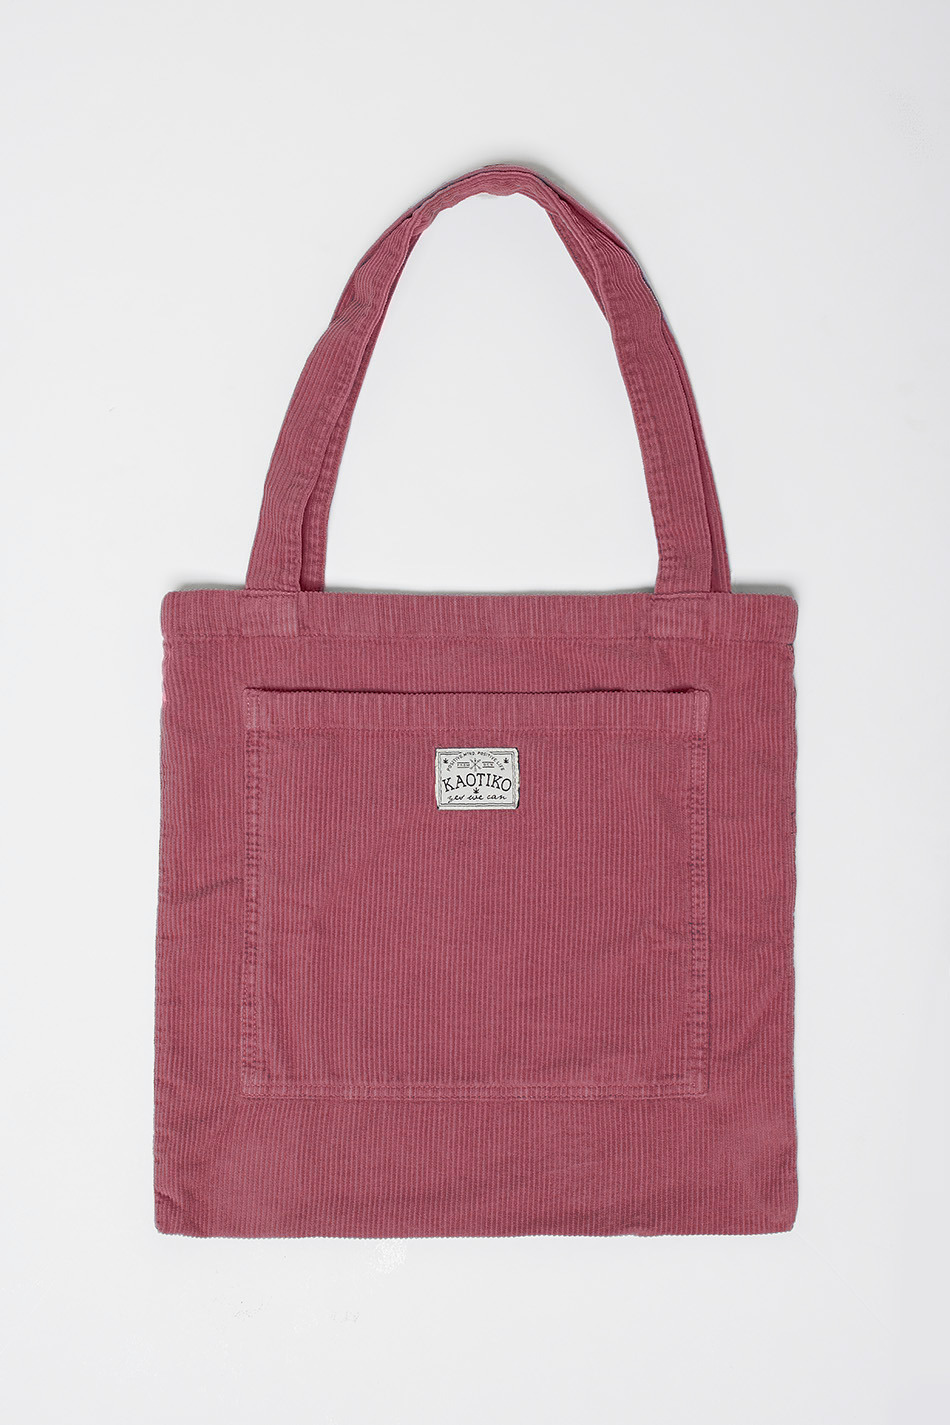 Tote Bag Corduroy Burgundy